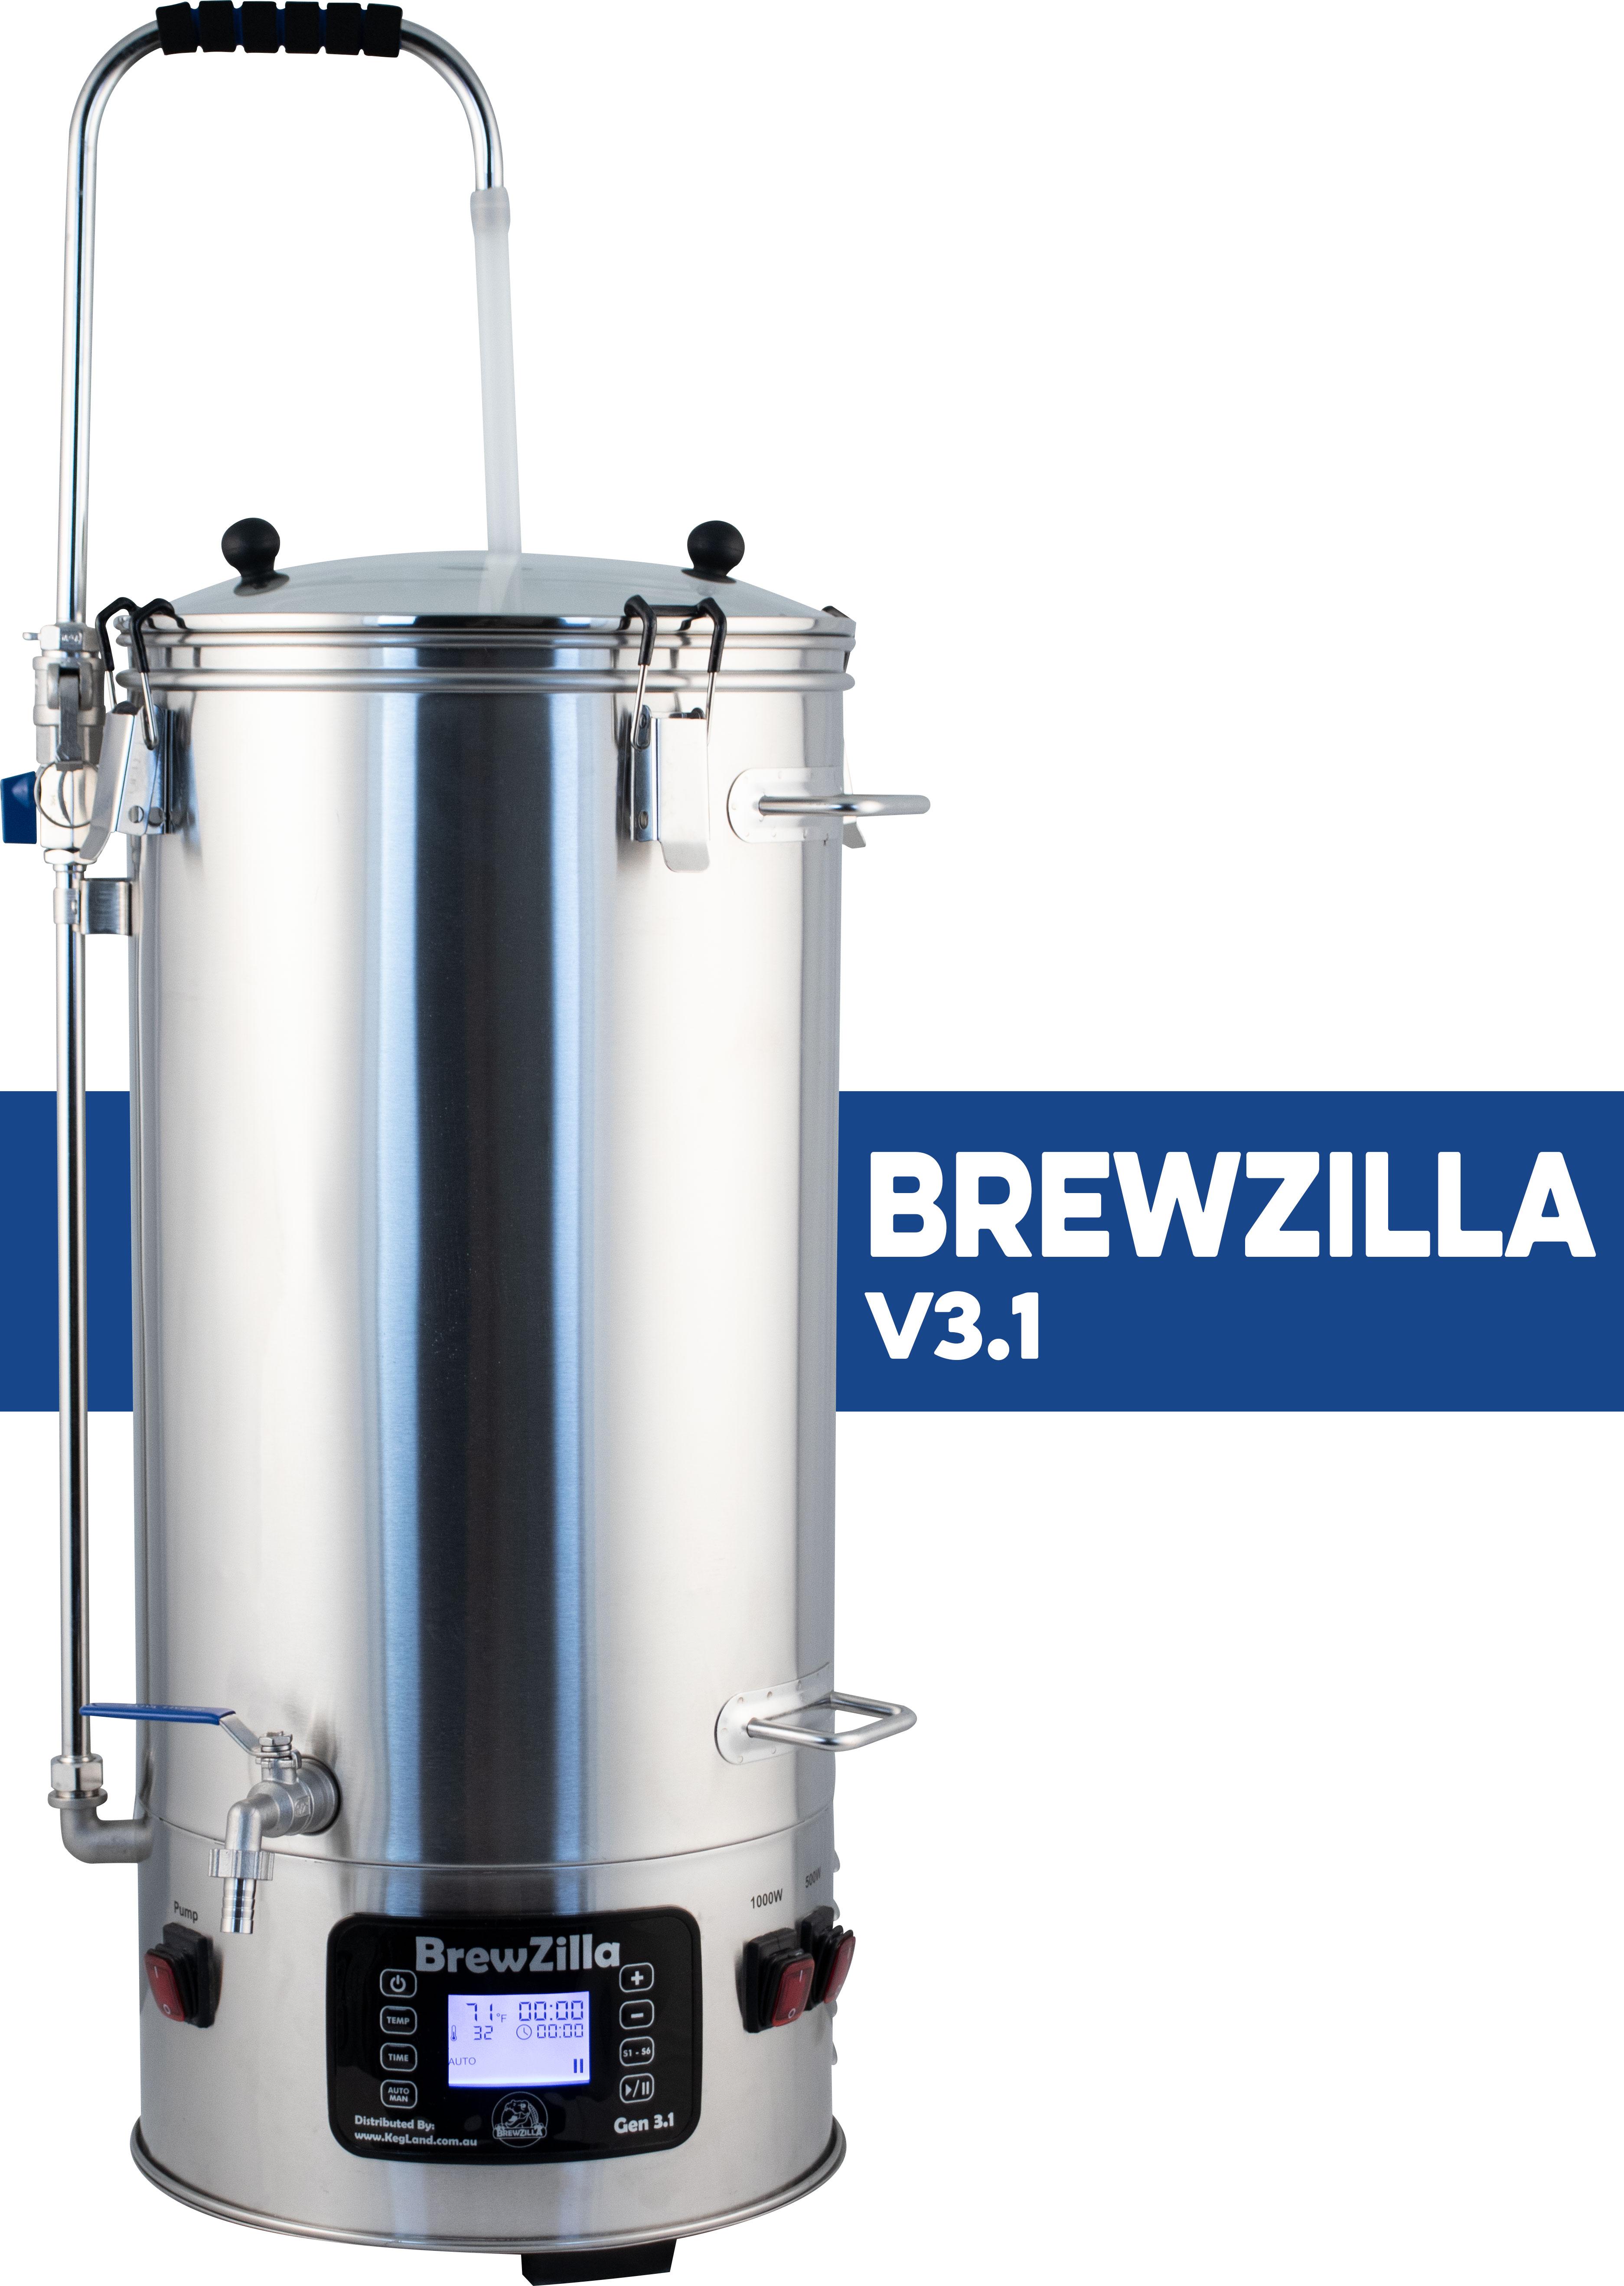 MoreBeer! BrewZilla V3.1 All Grain Brewing System Giveaway Giveaway Image